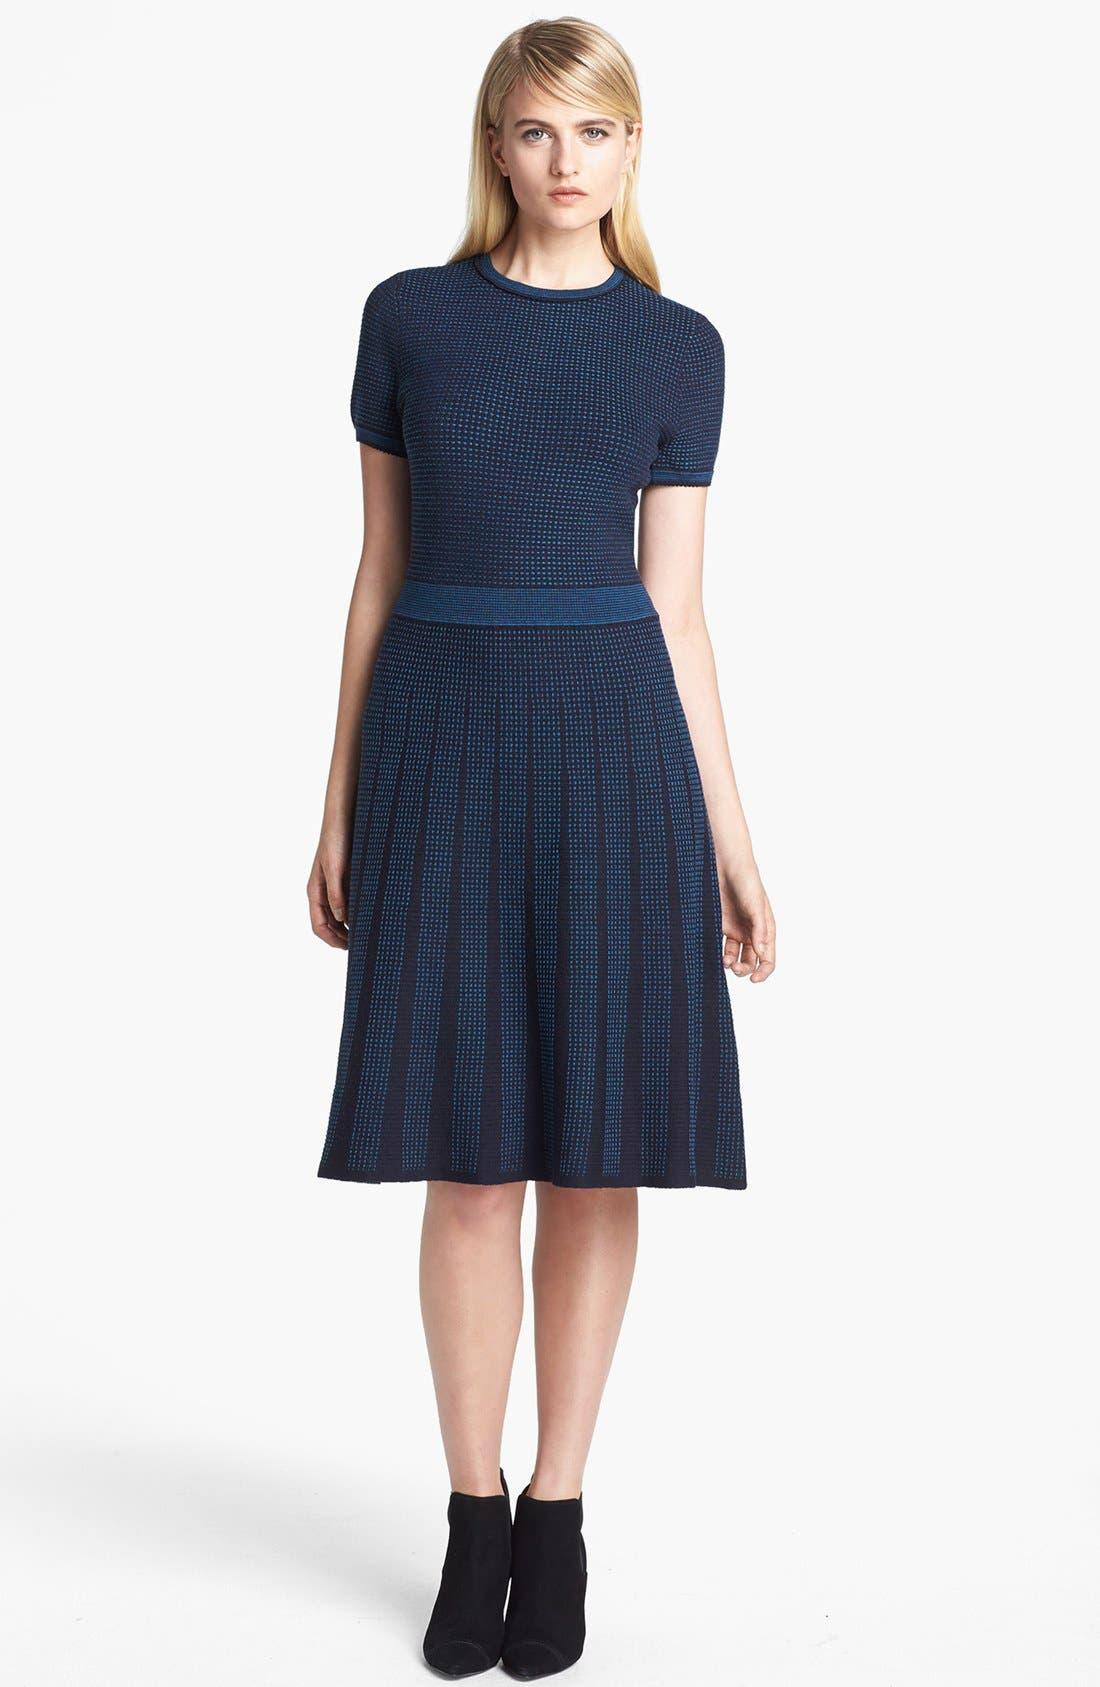 Alternate Image 1 Selected - Tory Burch 'Sadie' Wool Blend A-Line Dress